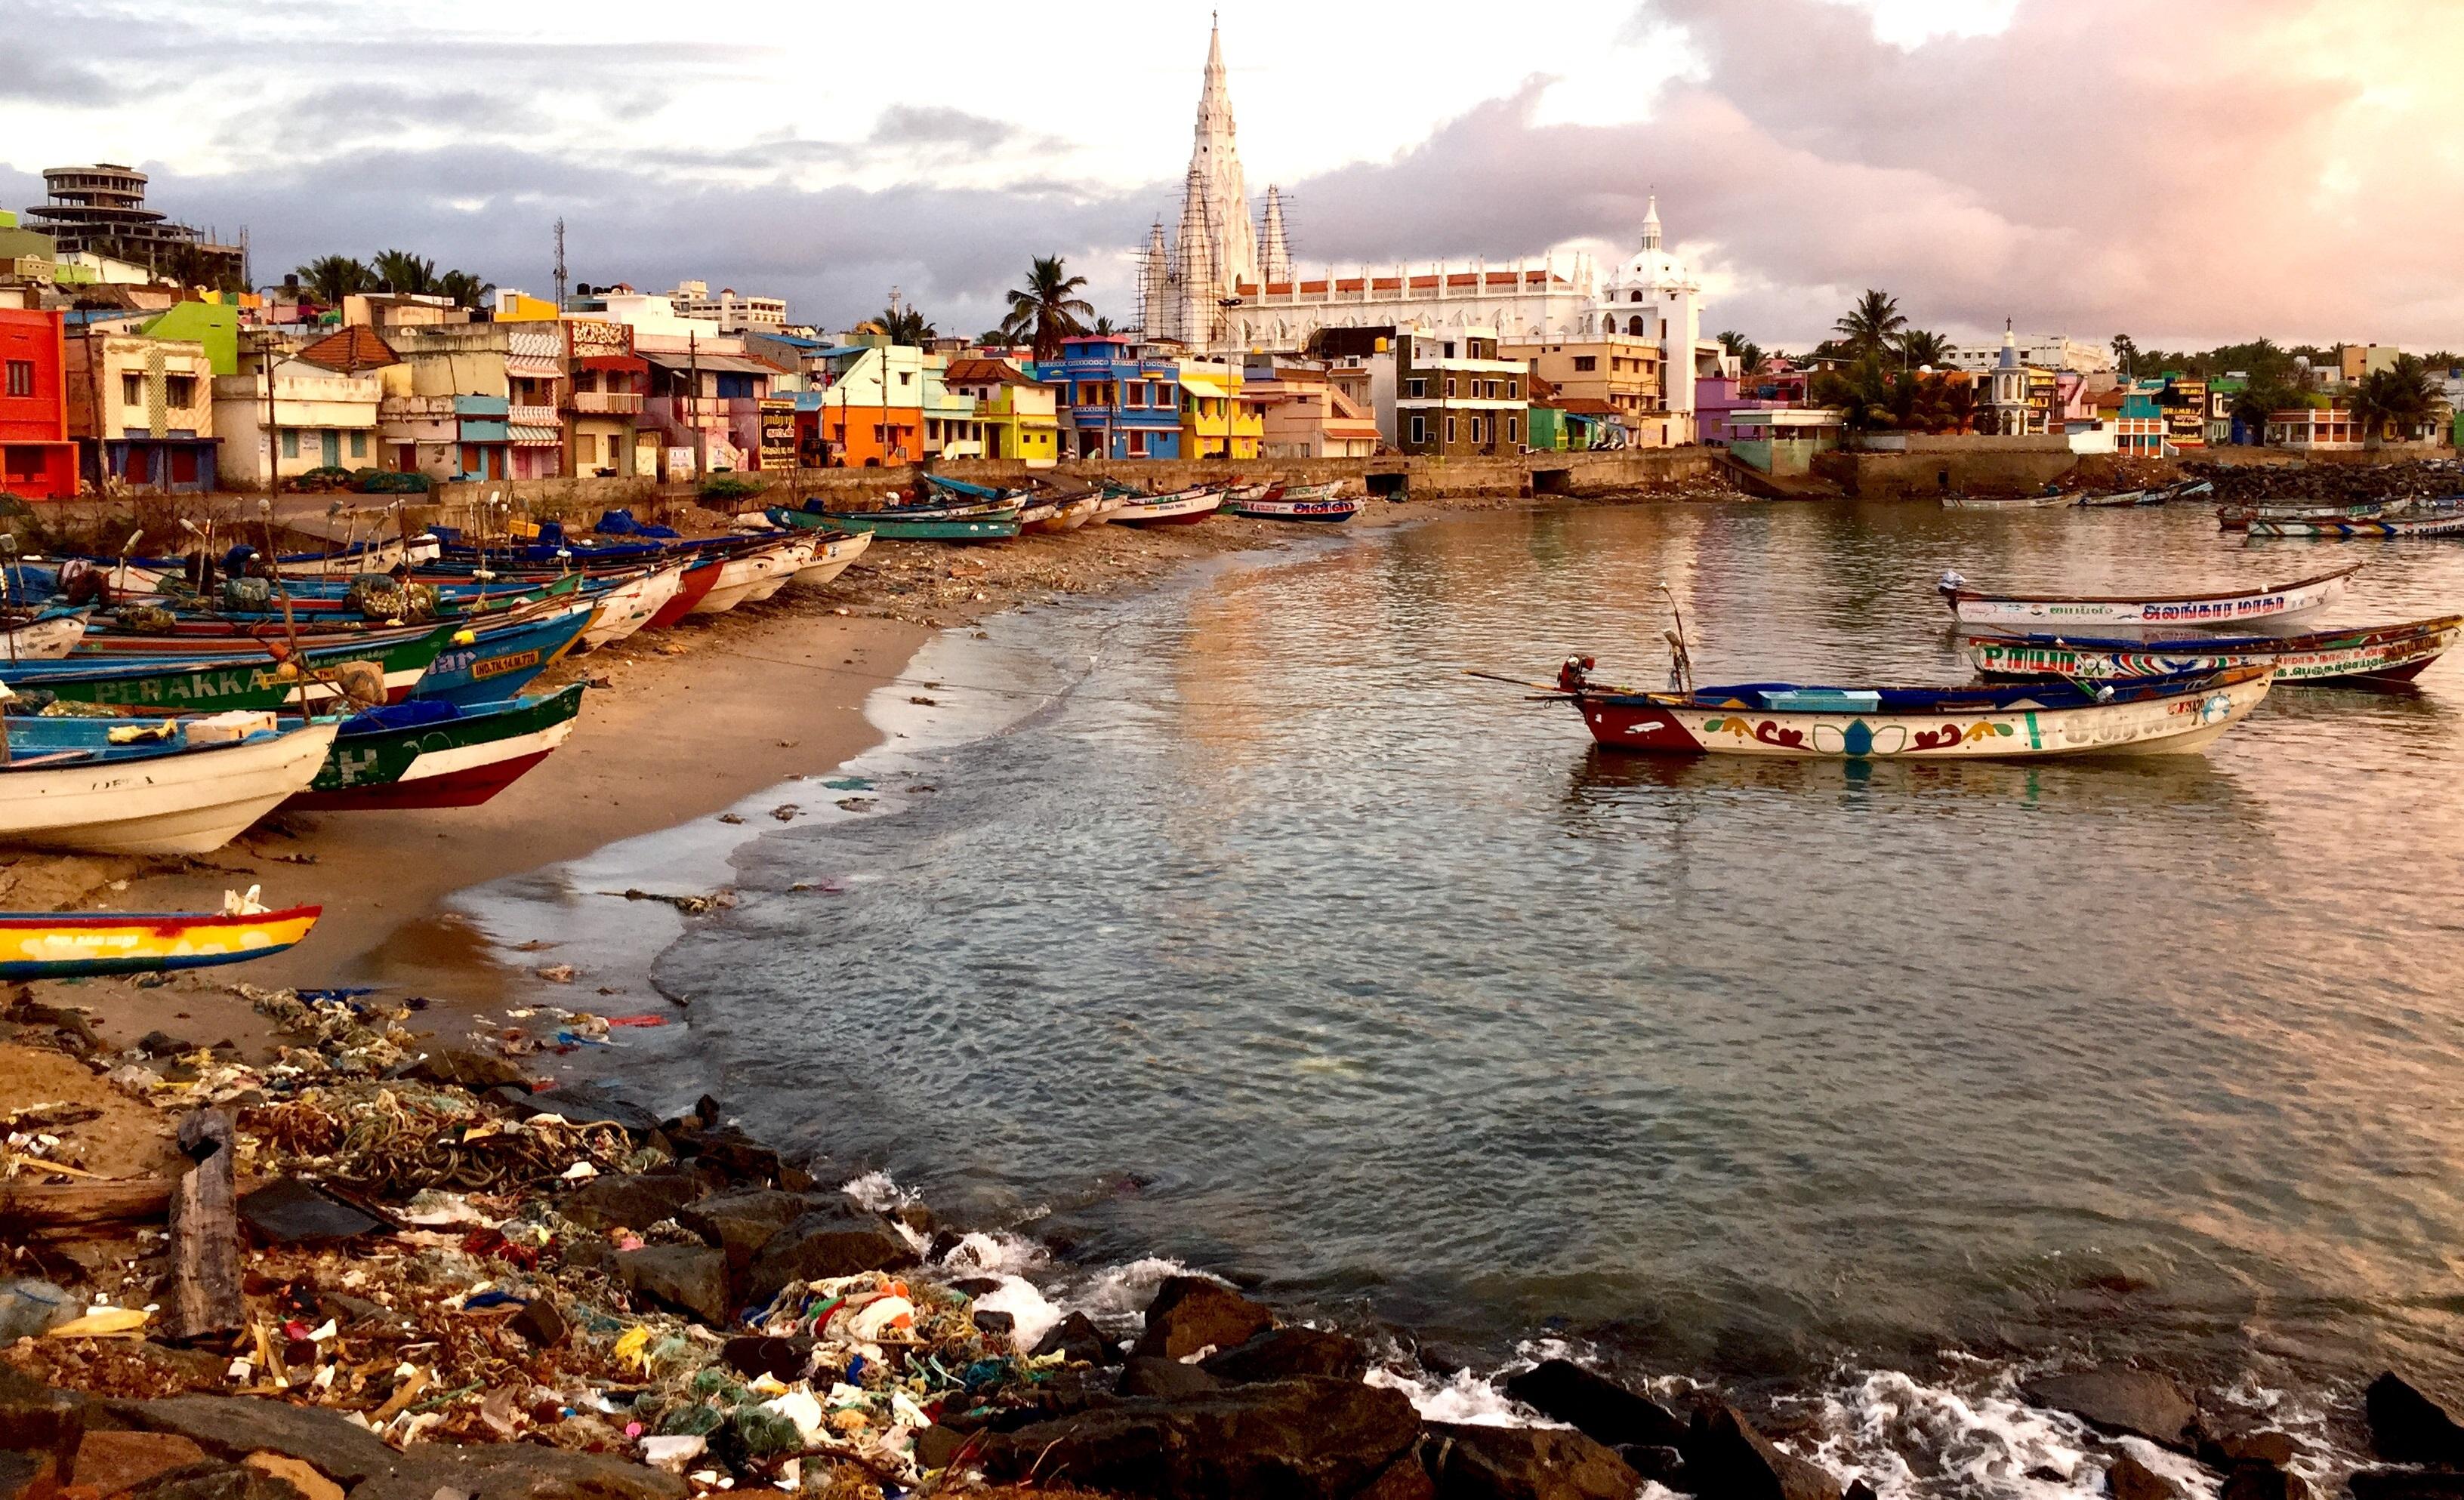 Environmental Protection in India 在滿街垃圾的印度街頭看見環保